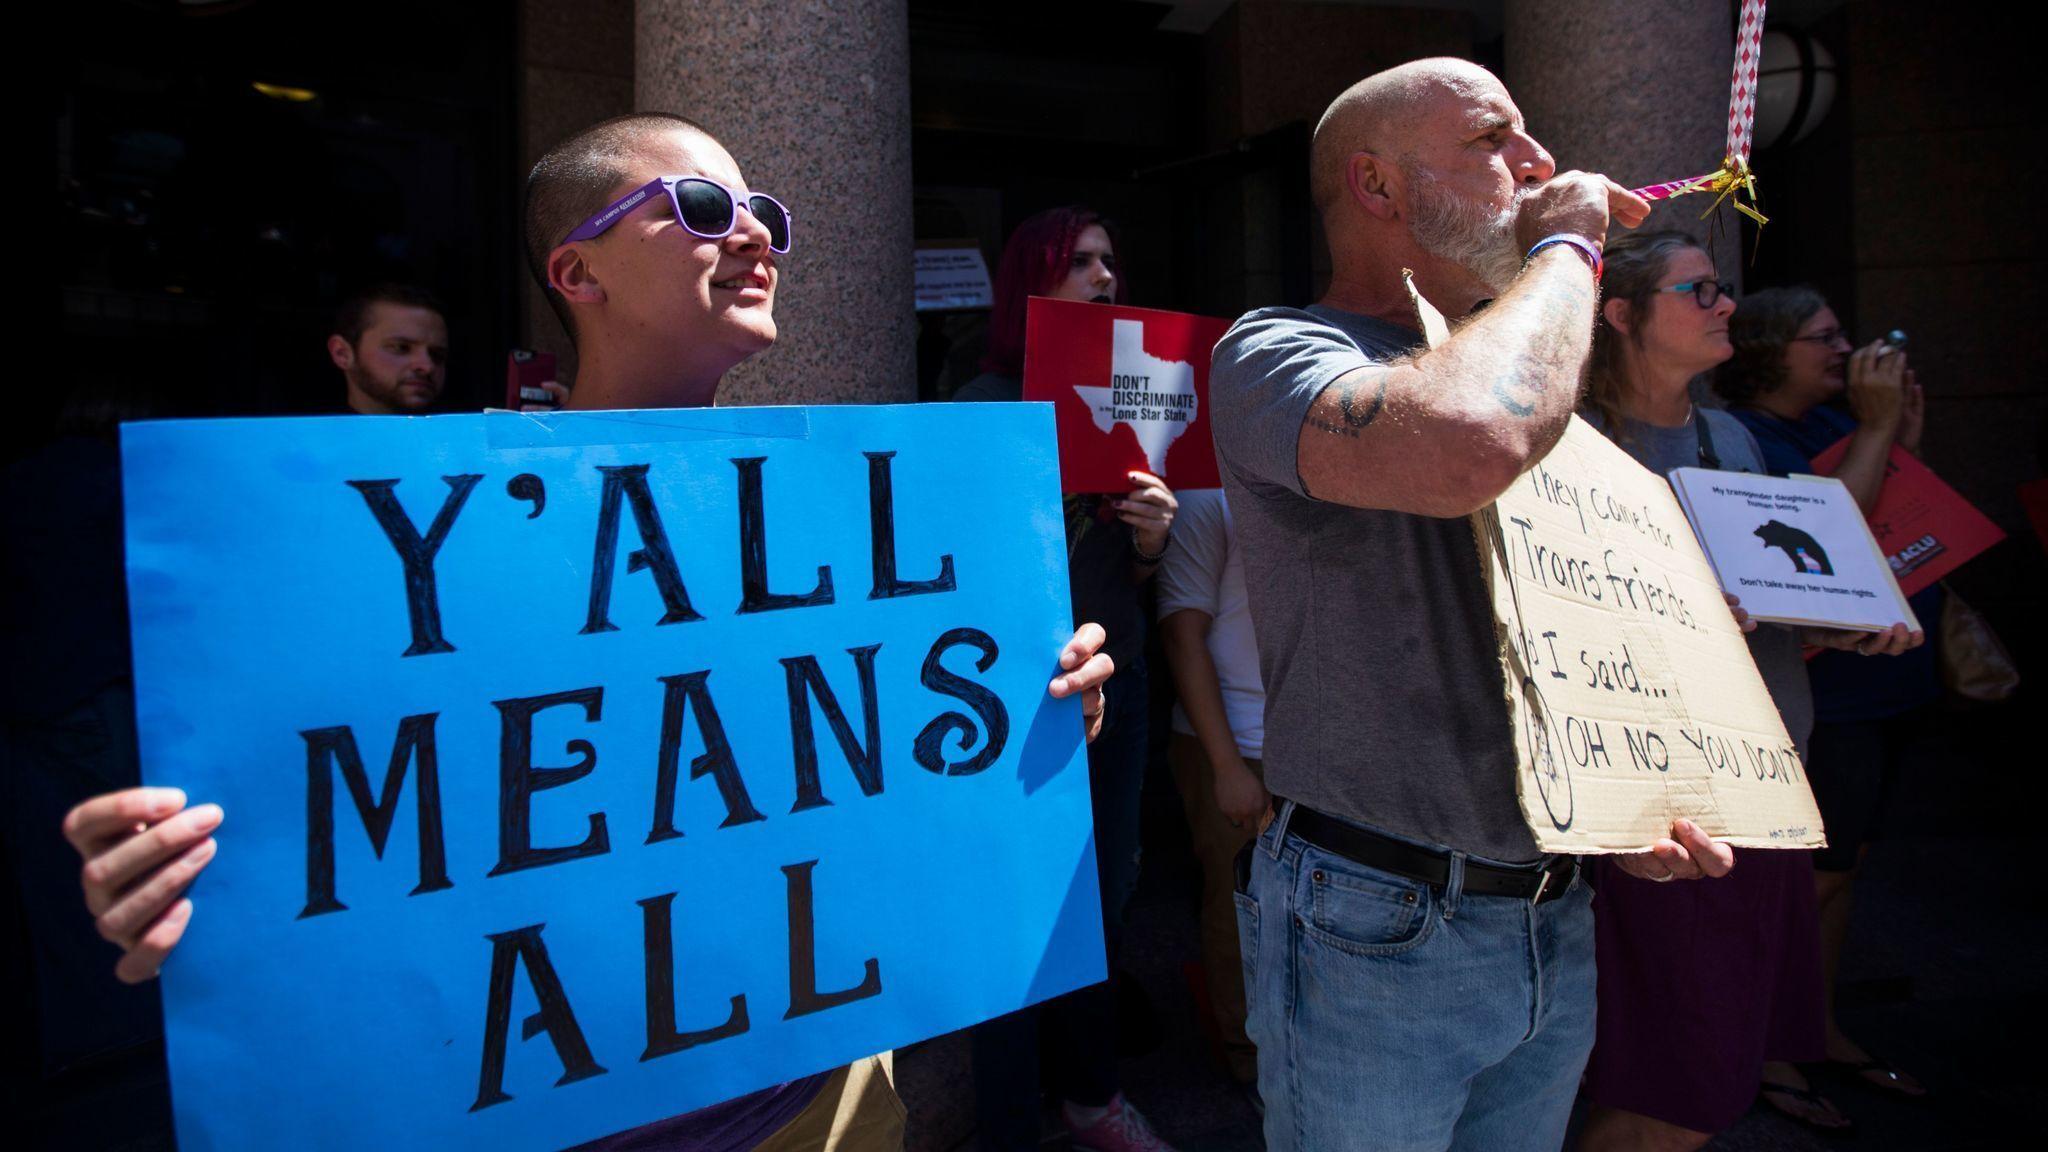 Texas 39 bathroom bill debate shows a widening gap between - Which states have bathroom bills ...